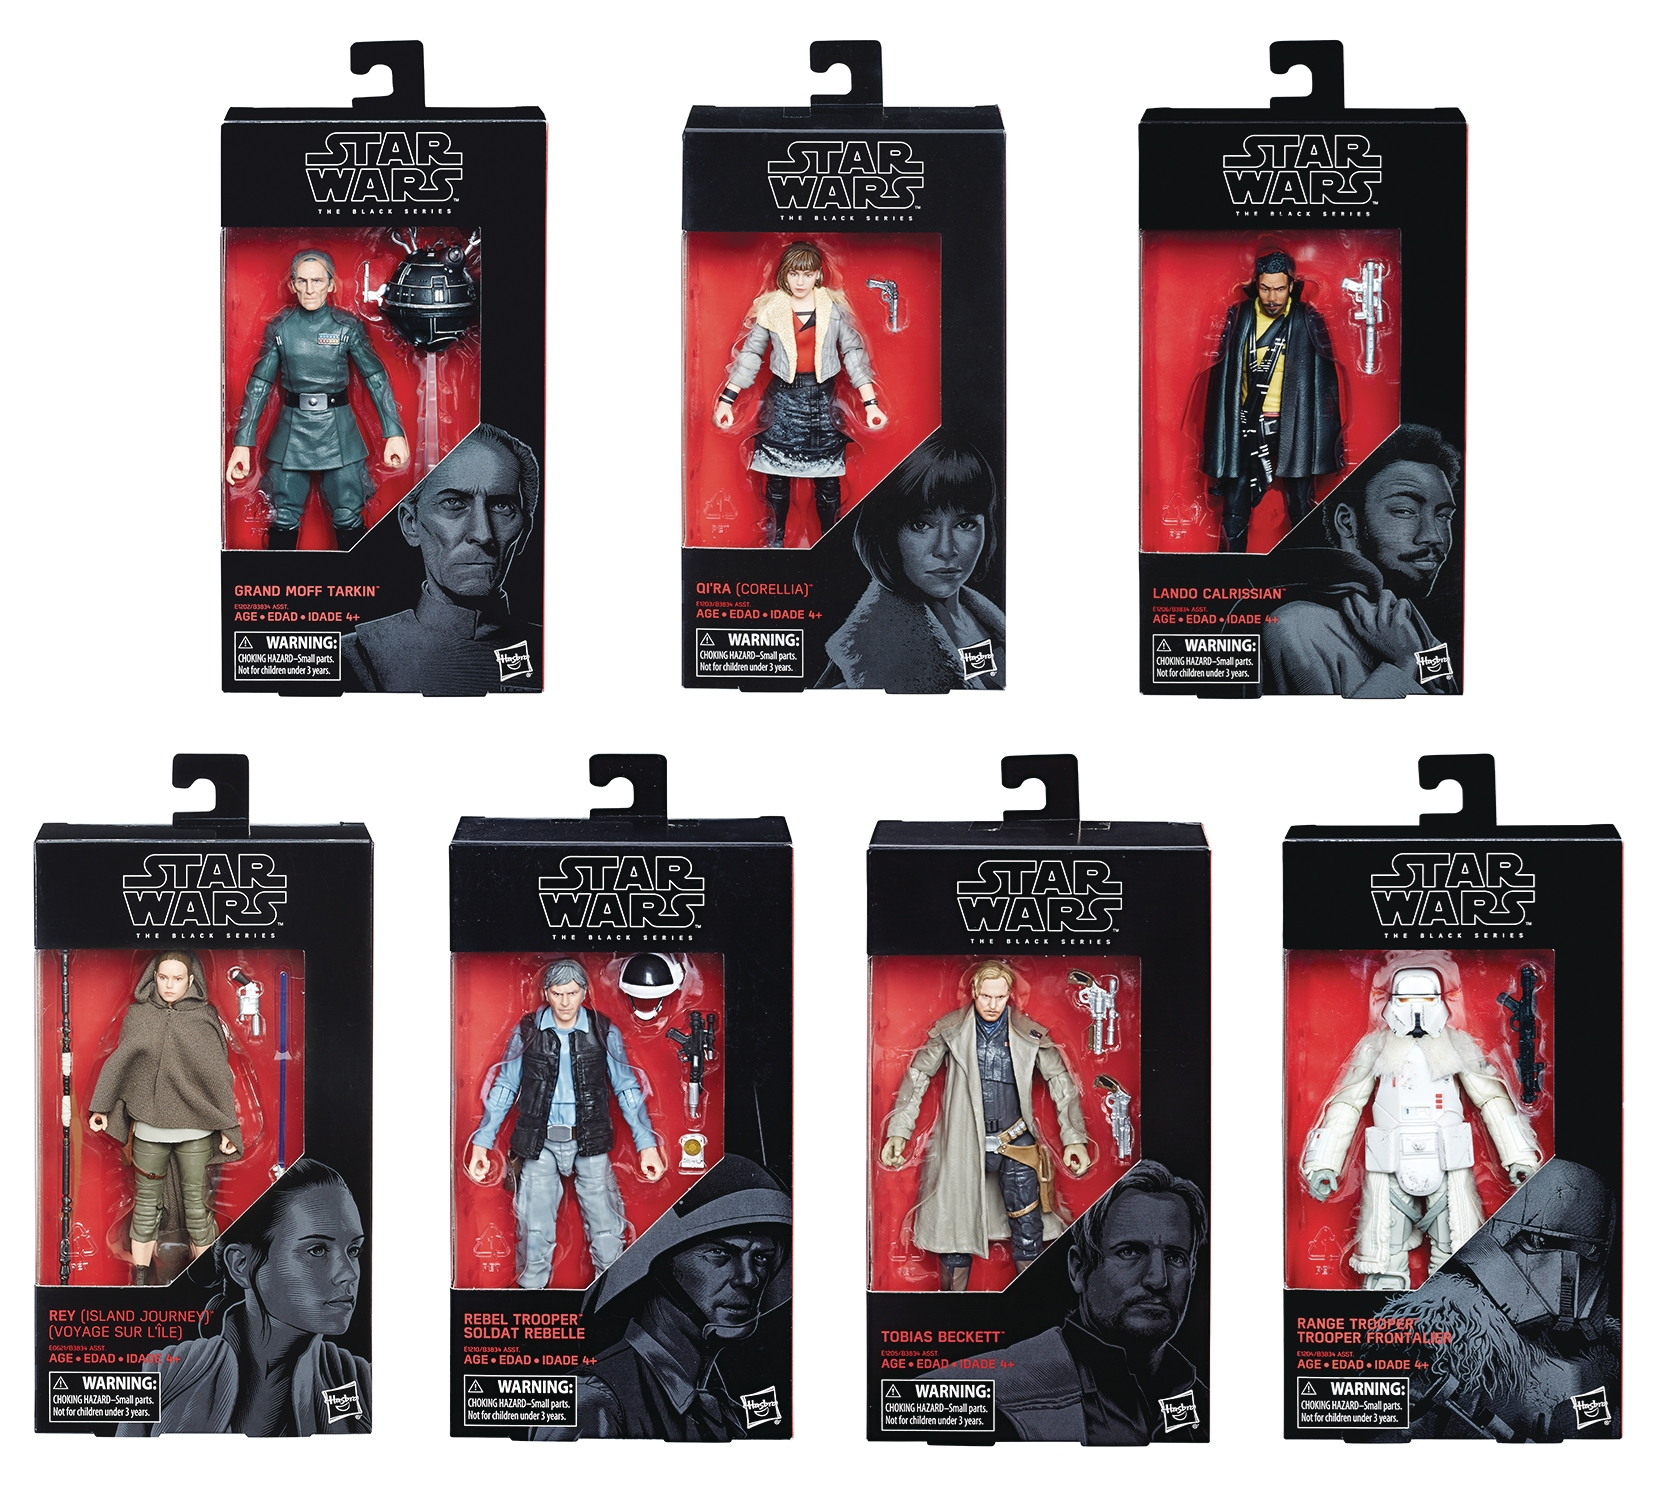 EN STOCK Hasbro Toys Star Wars Black Series Tobias Beckett Action Figure